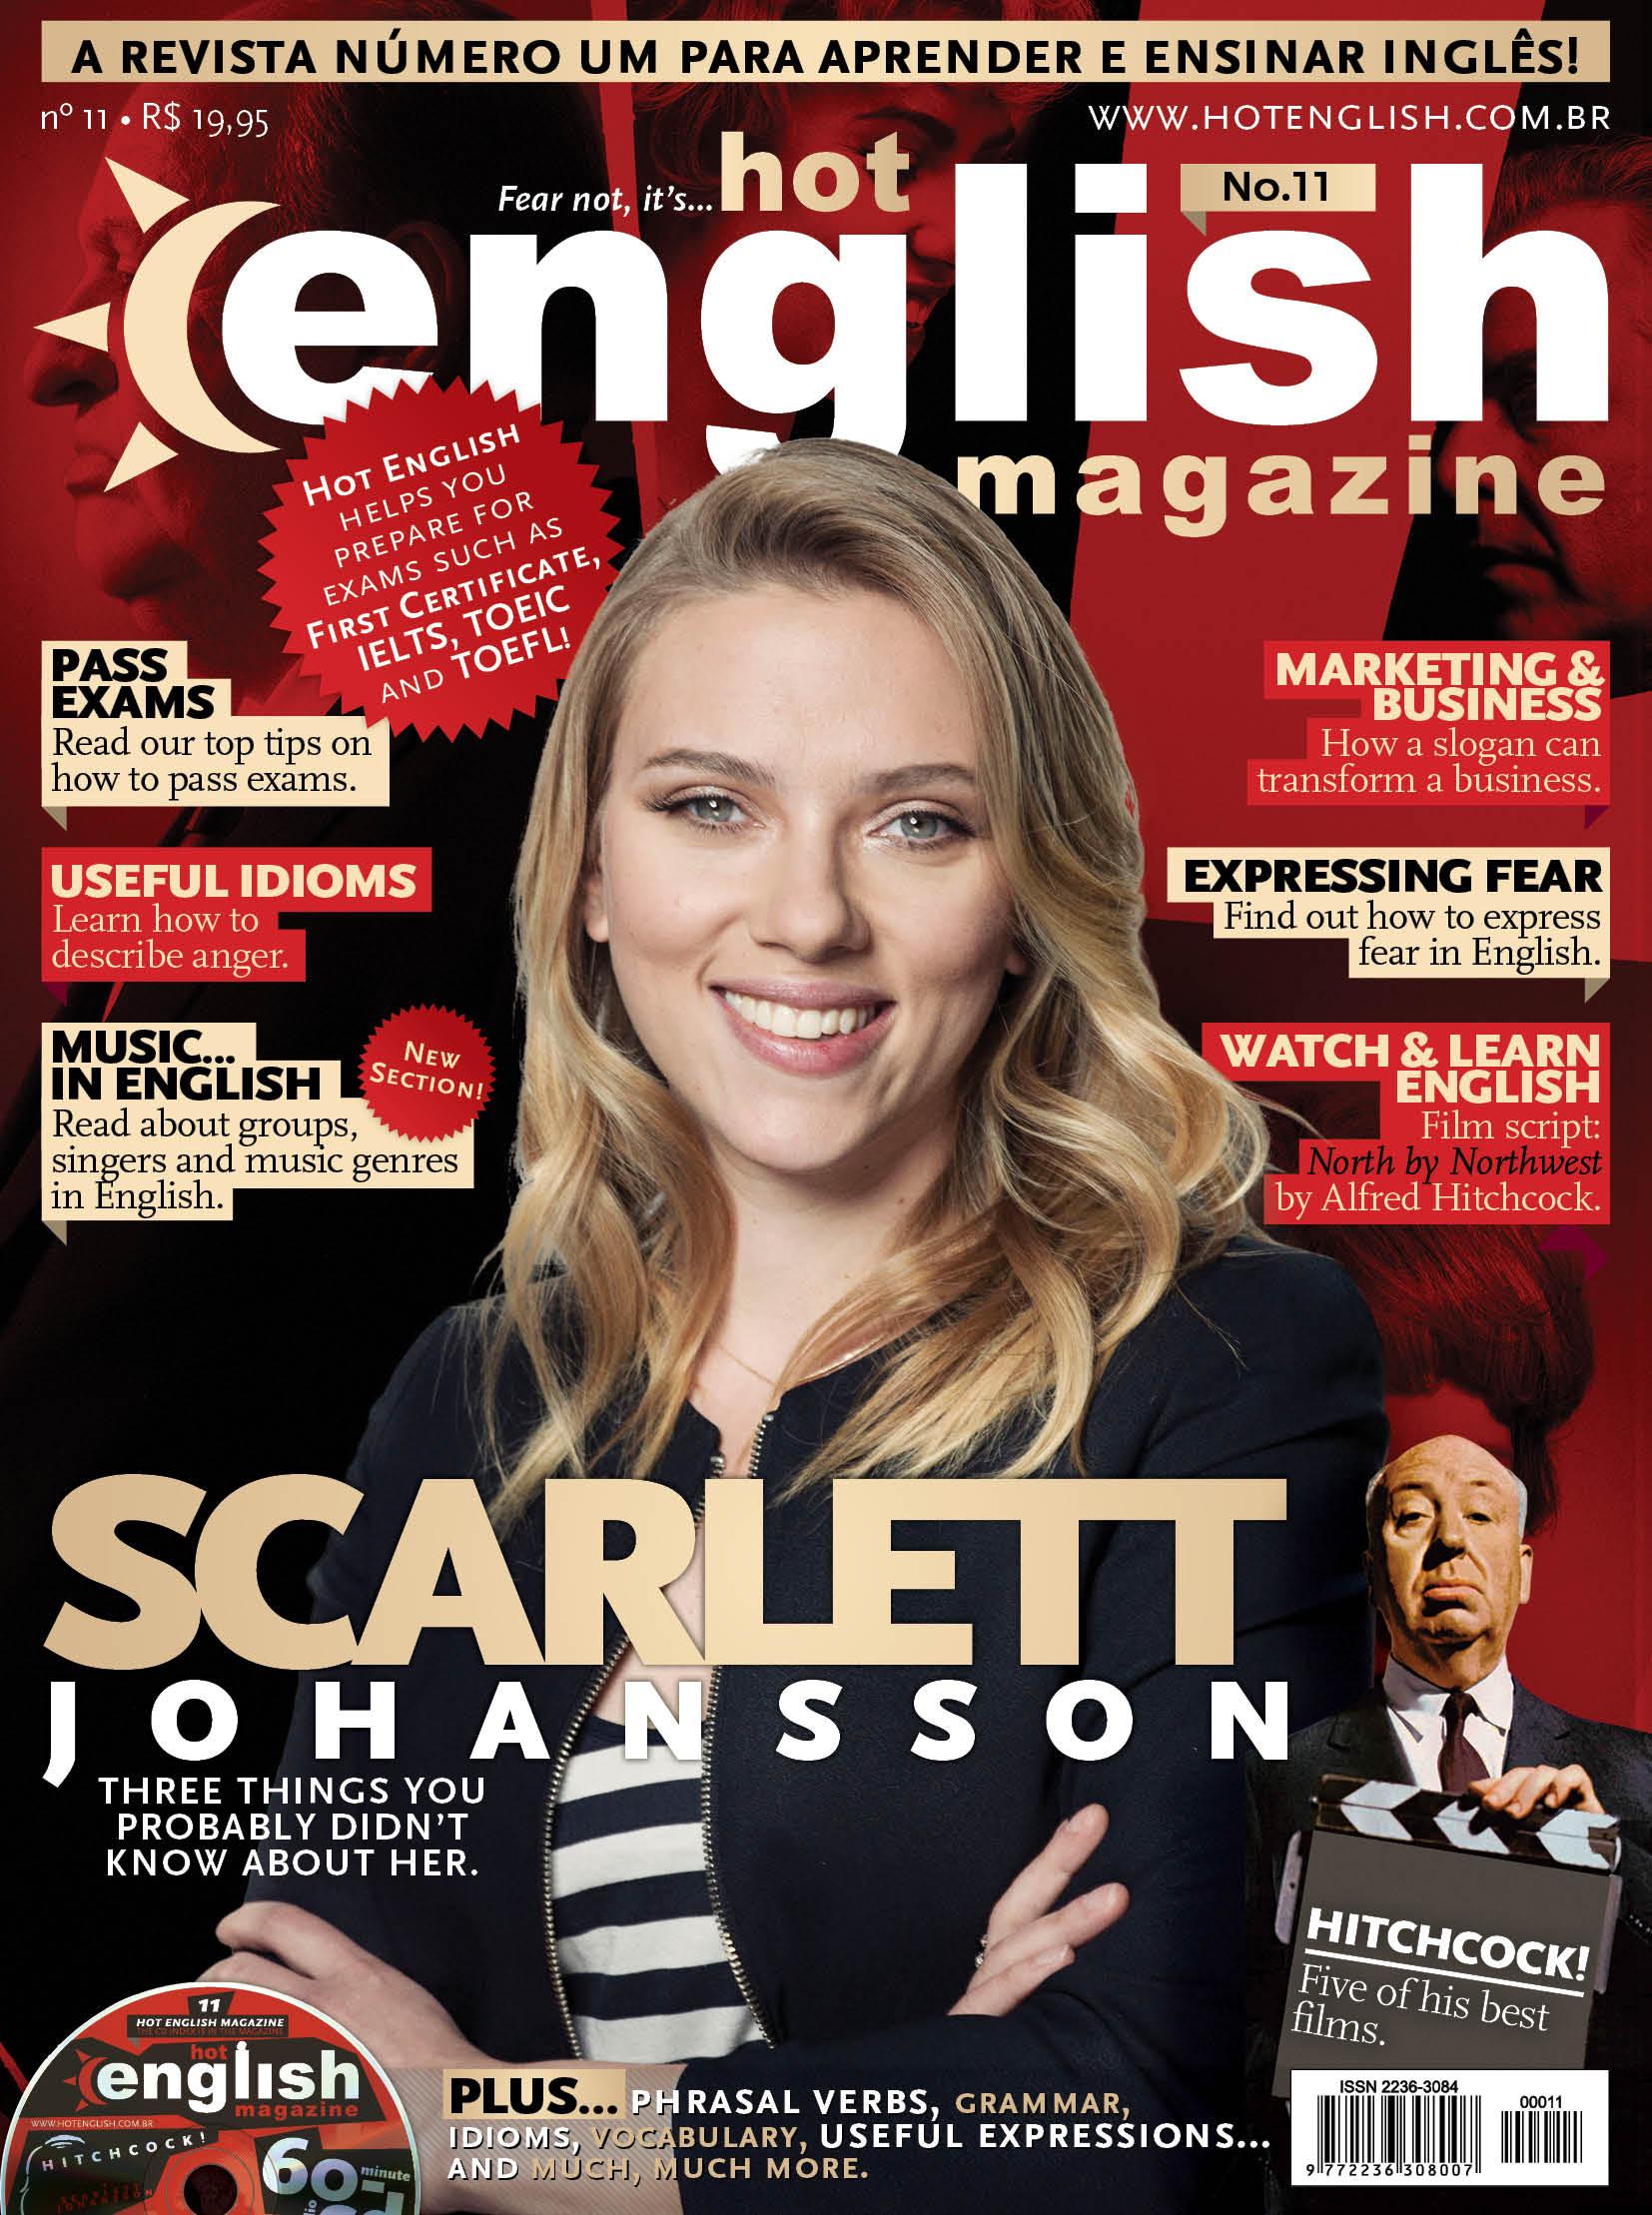 Scarlett johansson hitchcock - 2 6